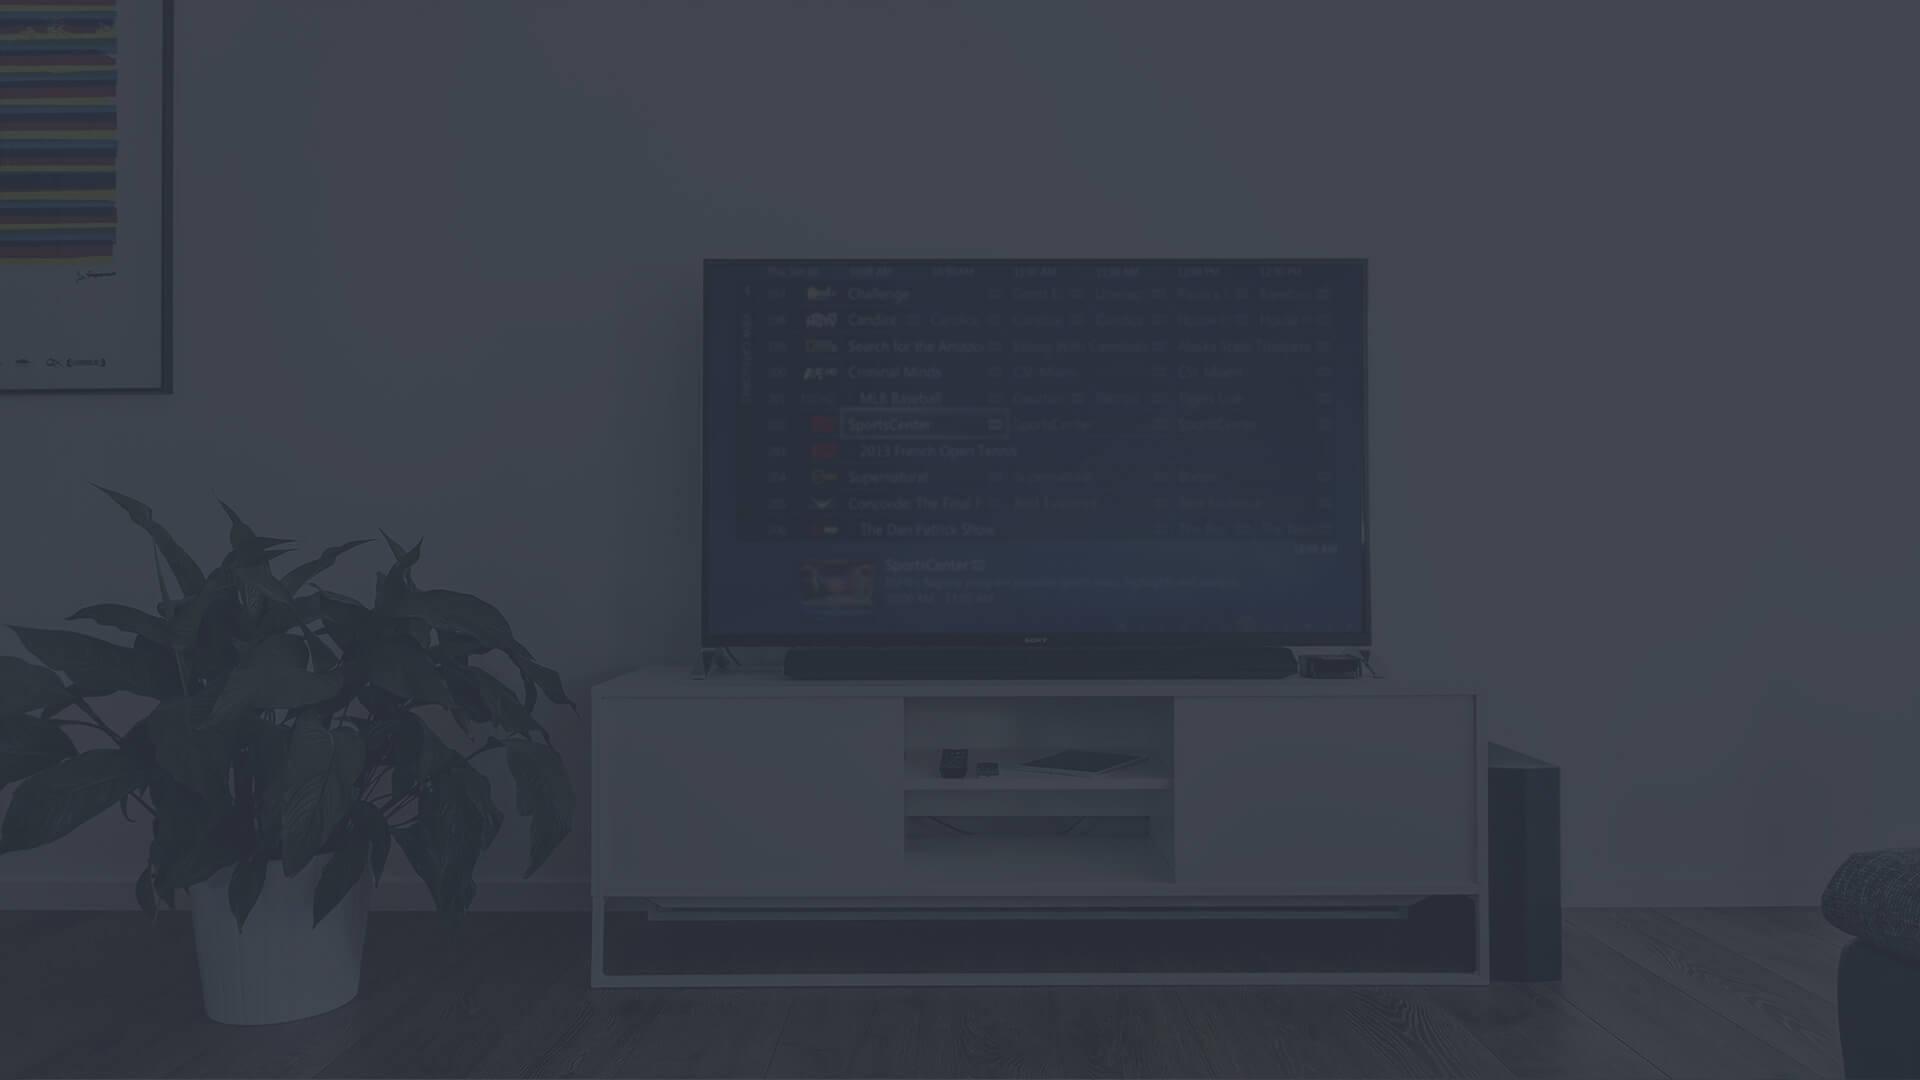 Equipment spectrum fee unreturned How to